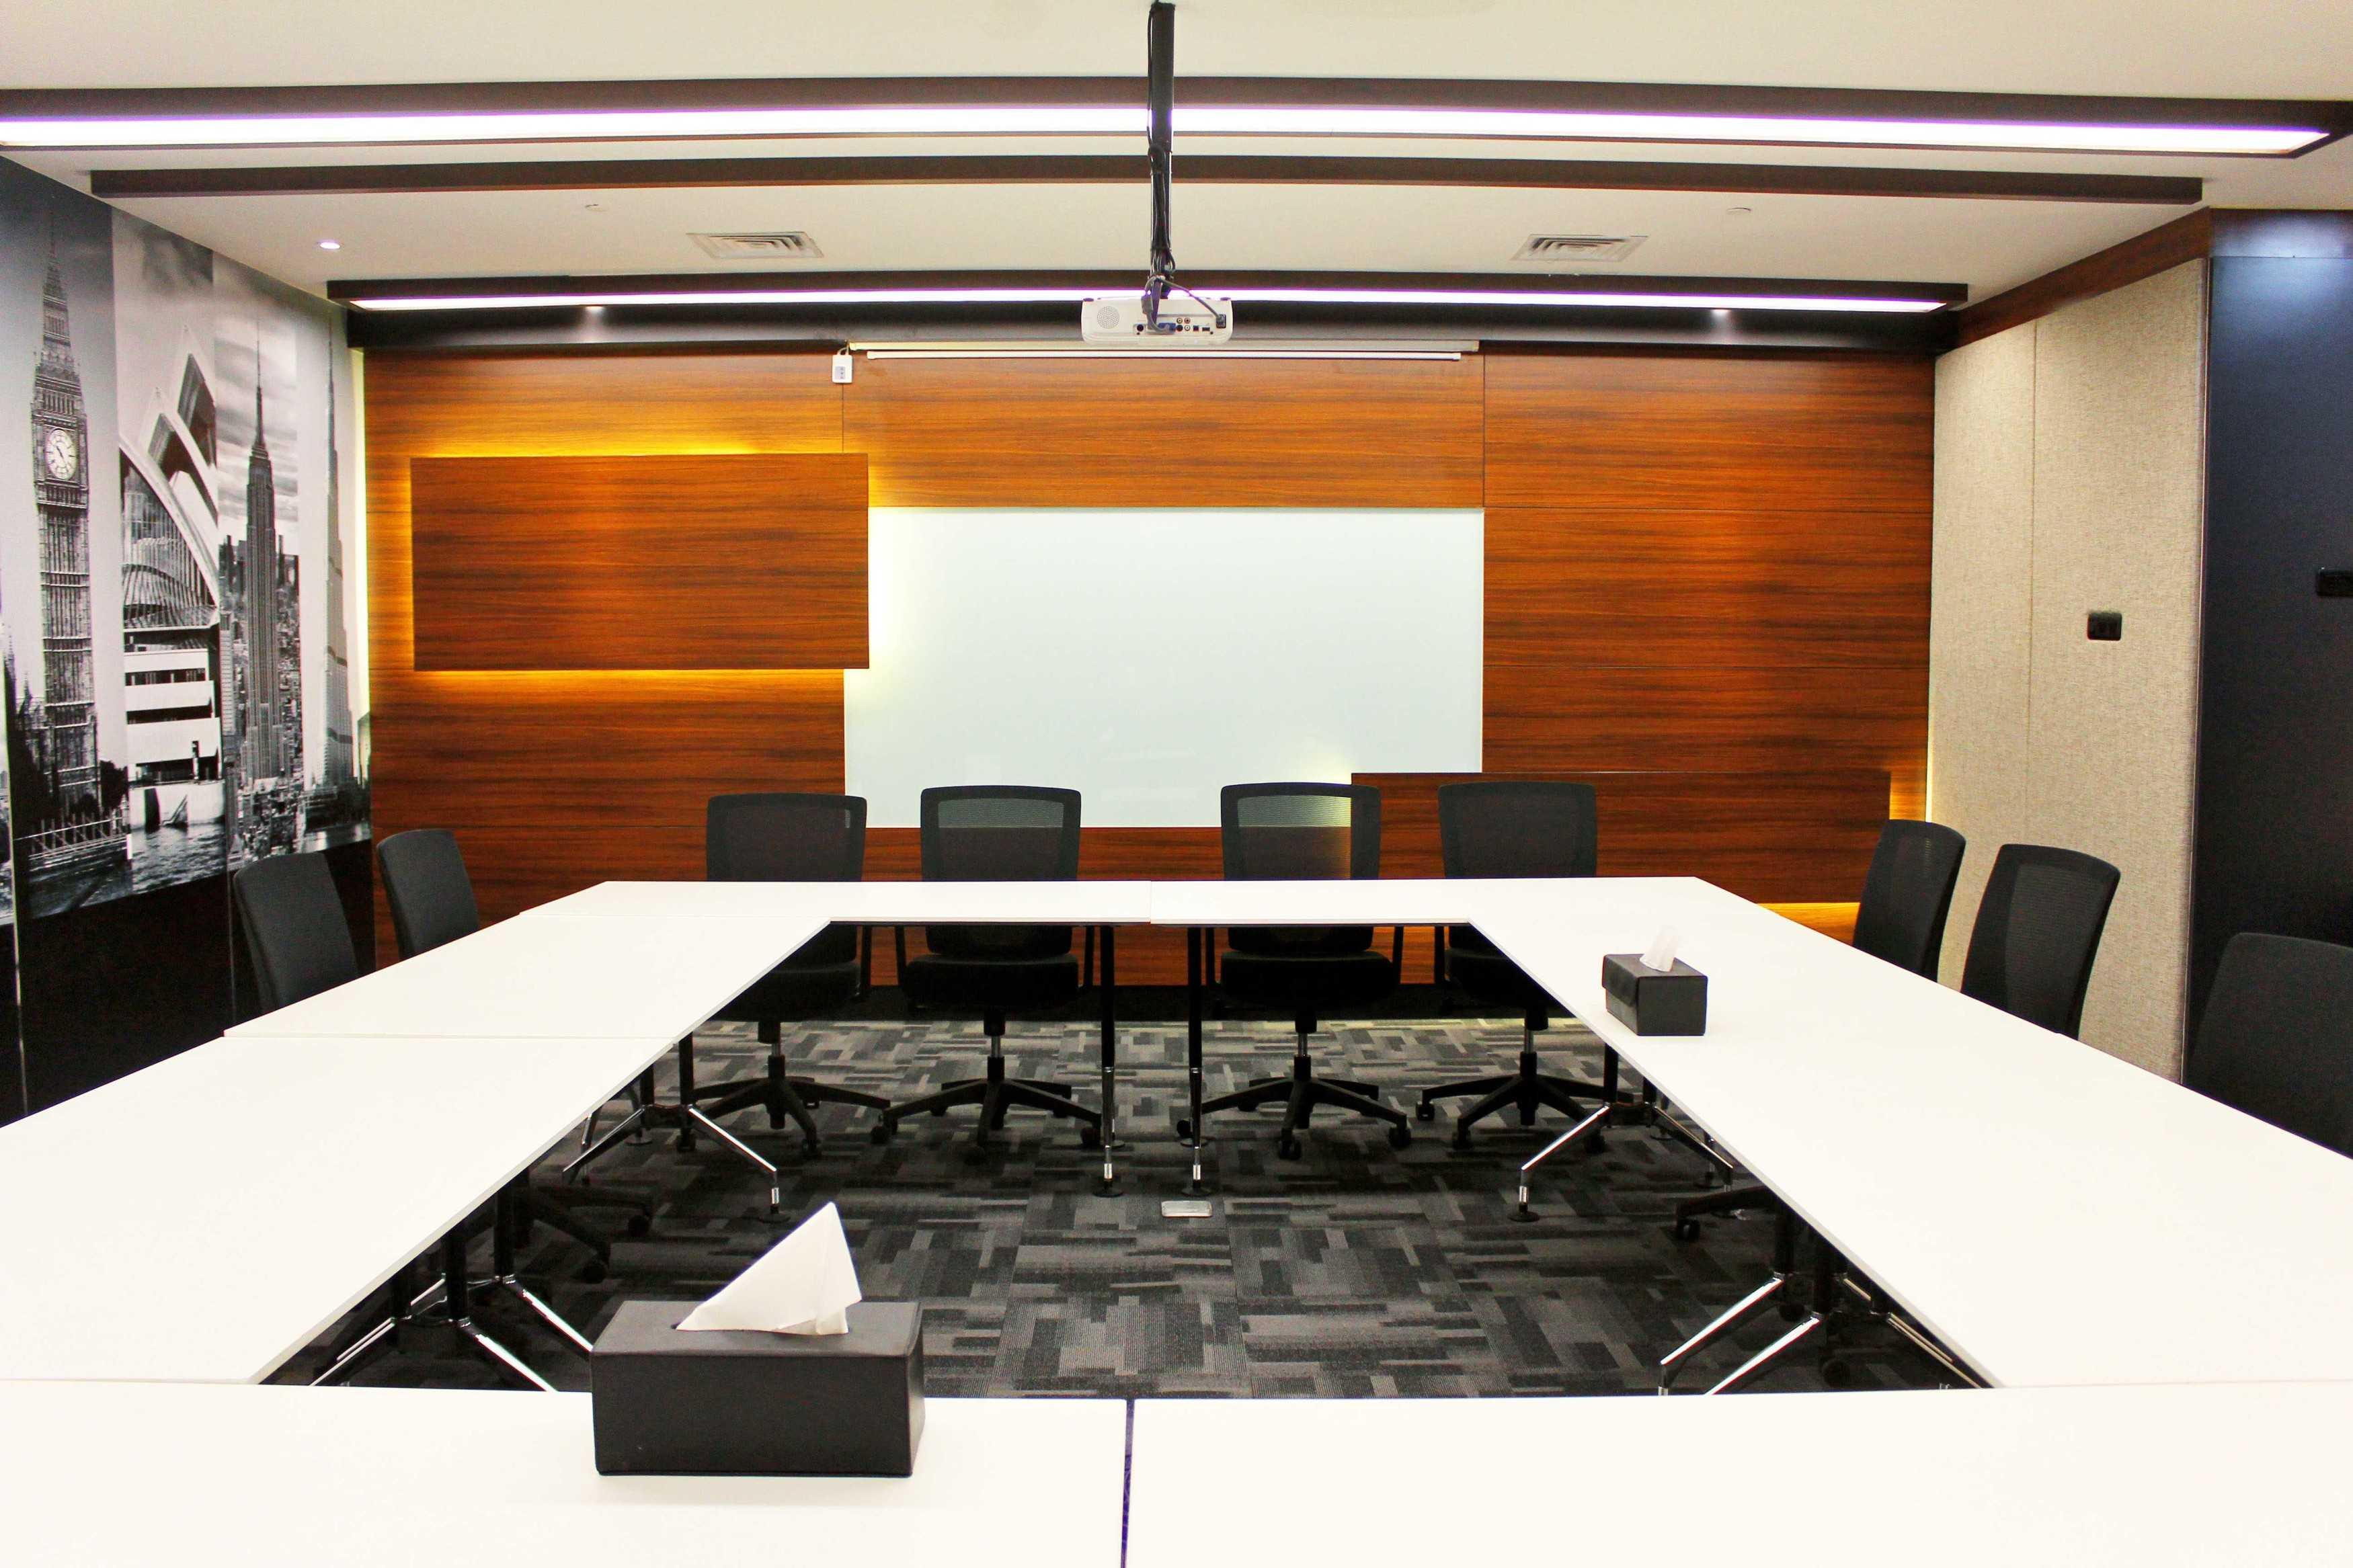 Kotak Design Equity Tower Building Management Office Jakarta, Daerah Khusus Ibukota Jakarta, Indonesia Jakarta, Daerah Khusus Ibukota Jakarta, Indonesia Meeting Room Modern  45616